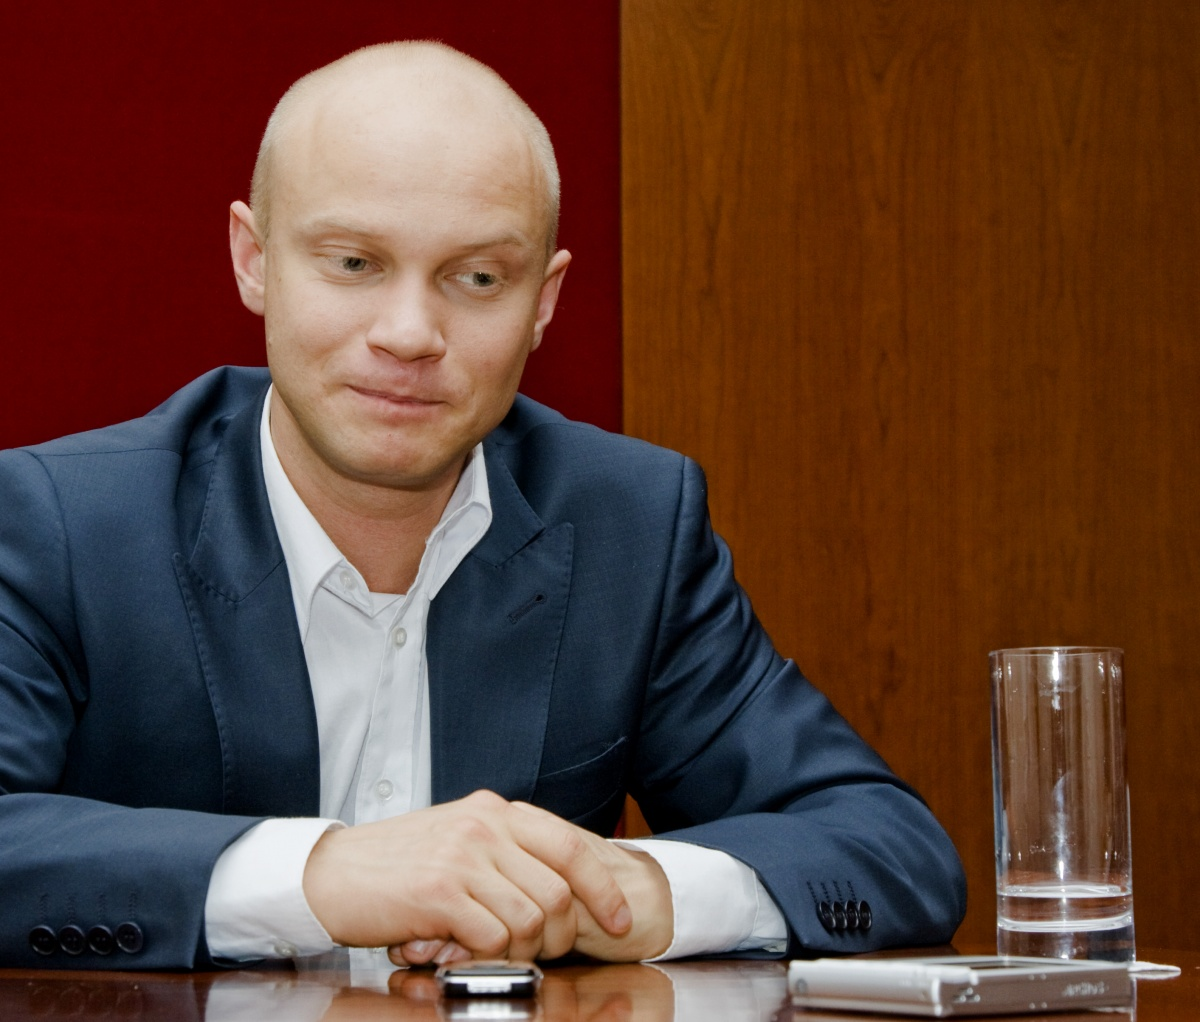 Биография и личная жизнь Дмитрия Хрусталева фото